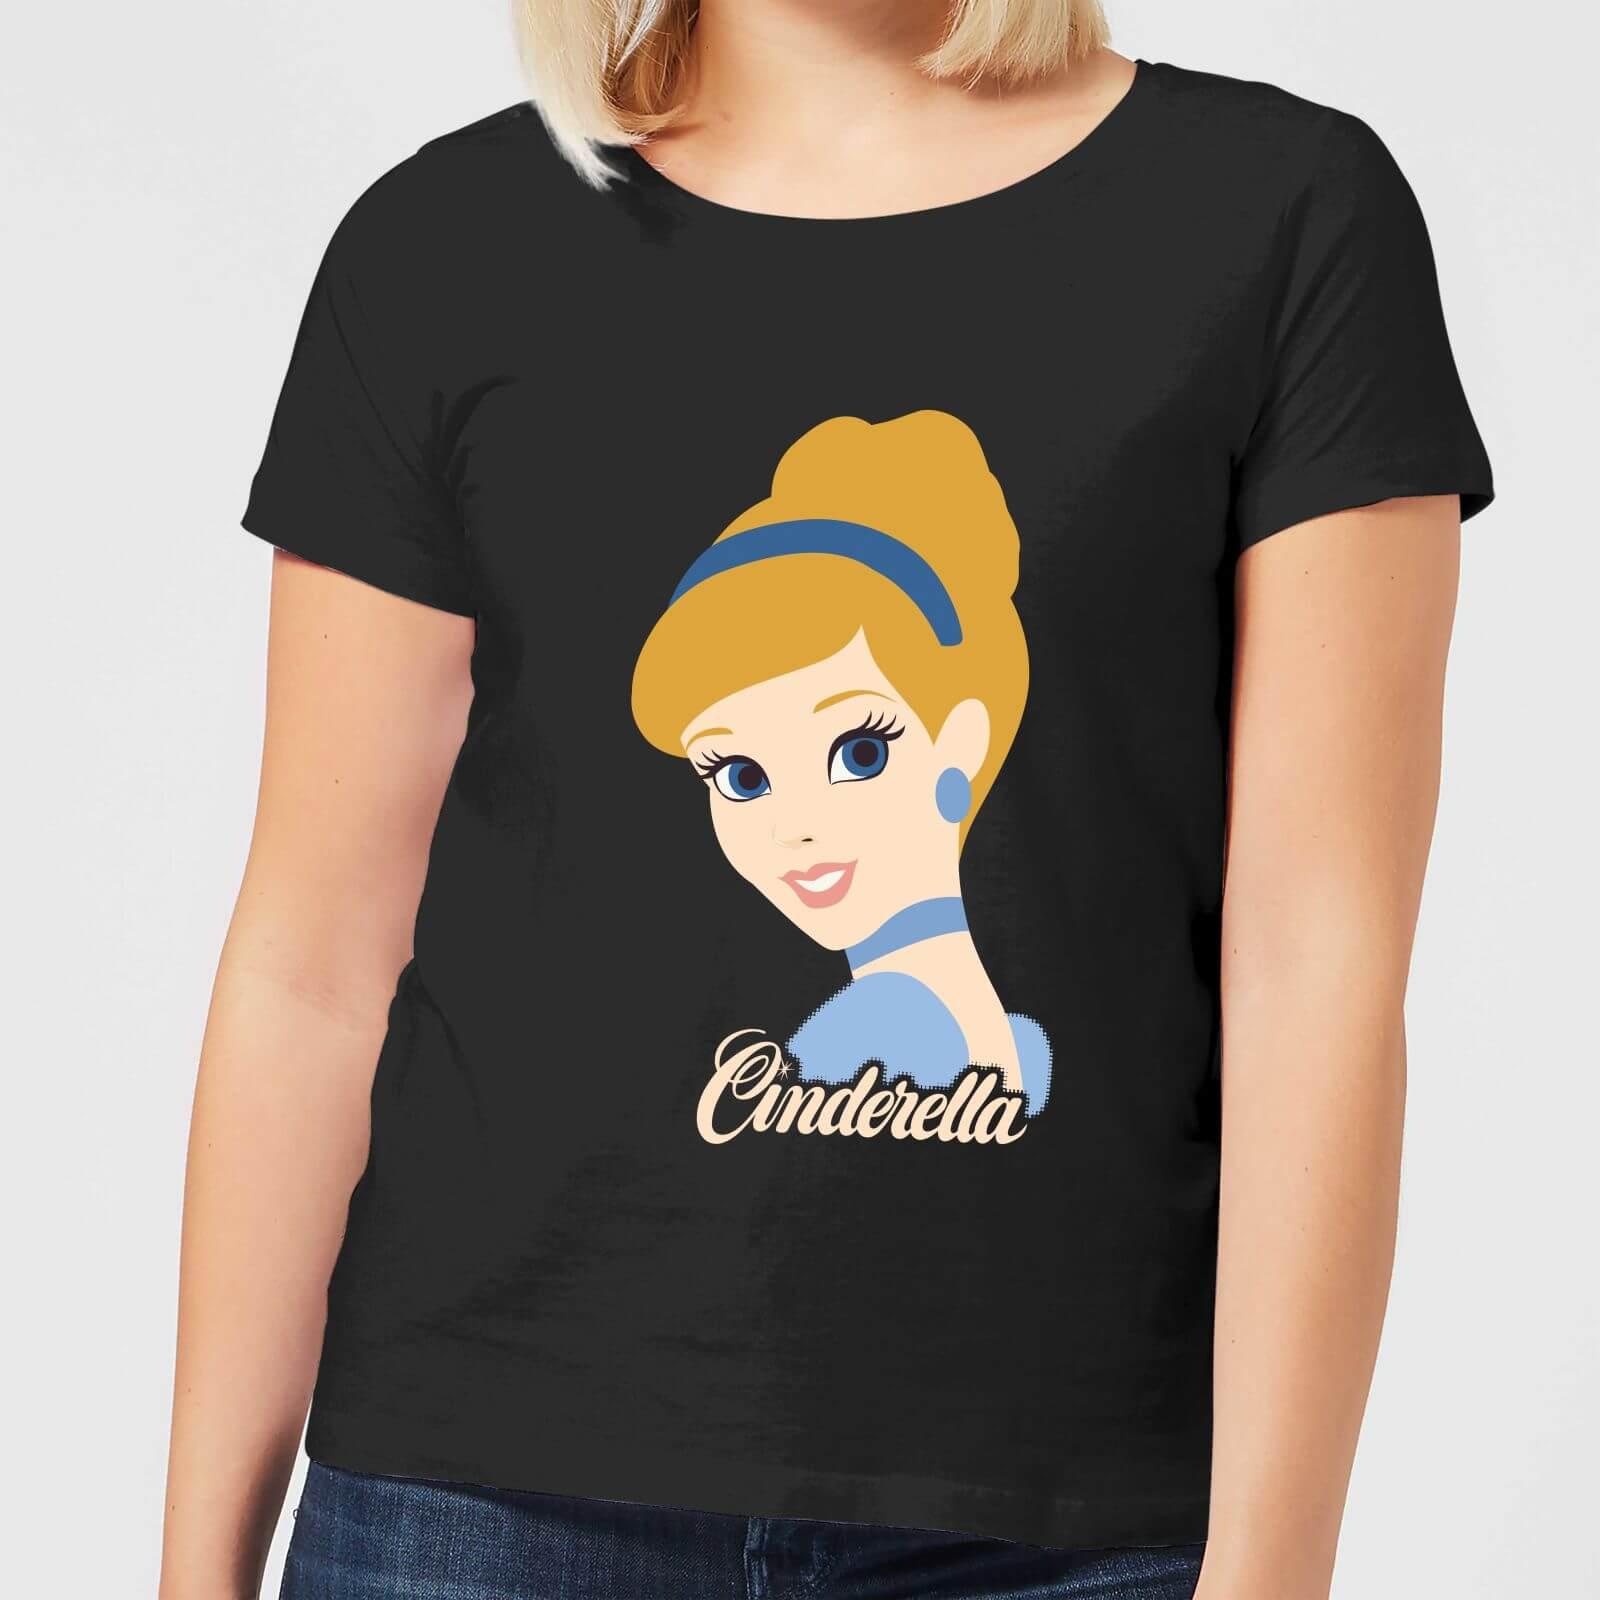 Disney Princess Colour Silhouette Cinderella Women's T-Shirt - Black - S - Black